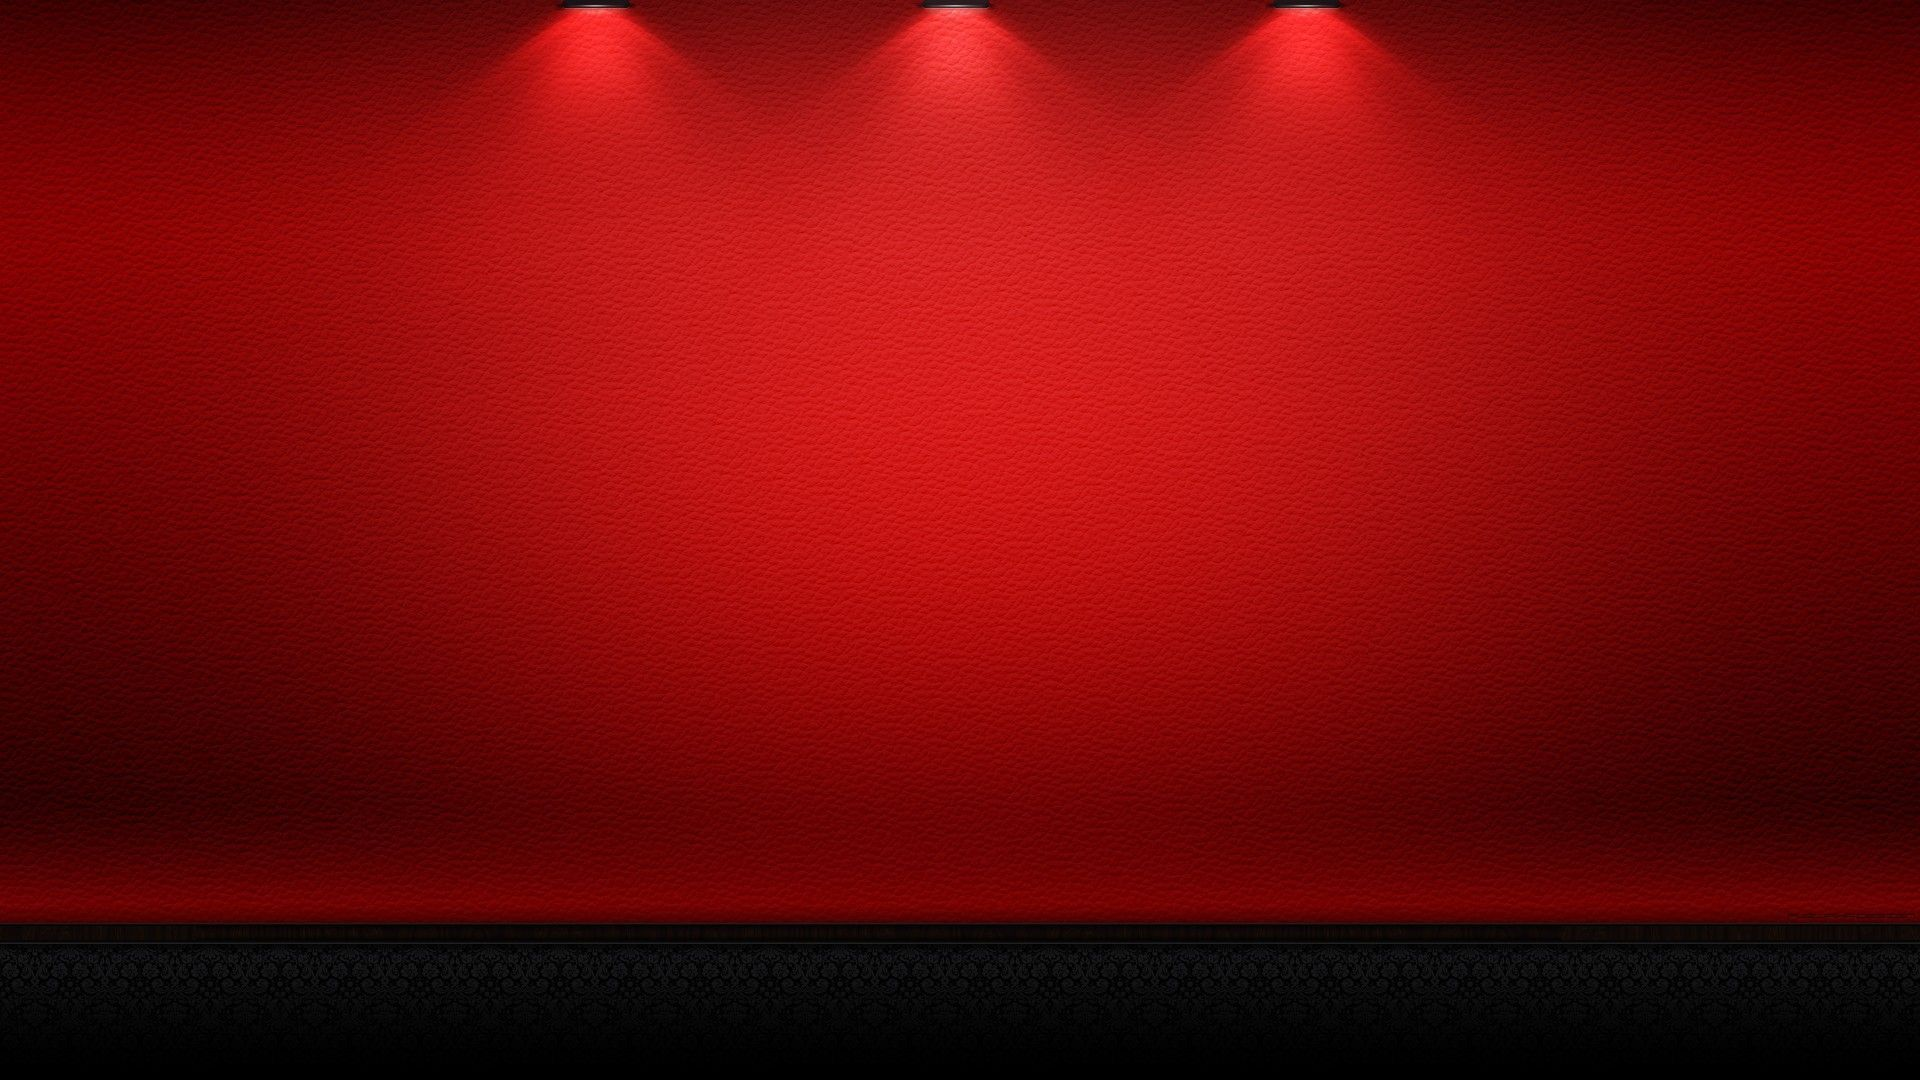 Plain Red Desktop Wallpapers ...